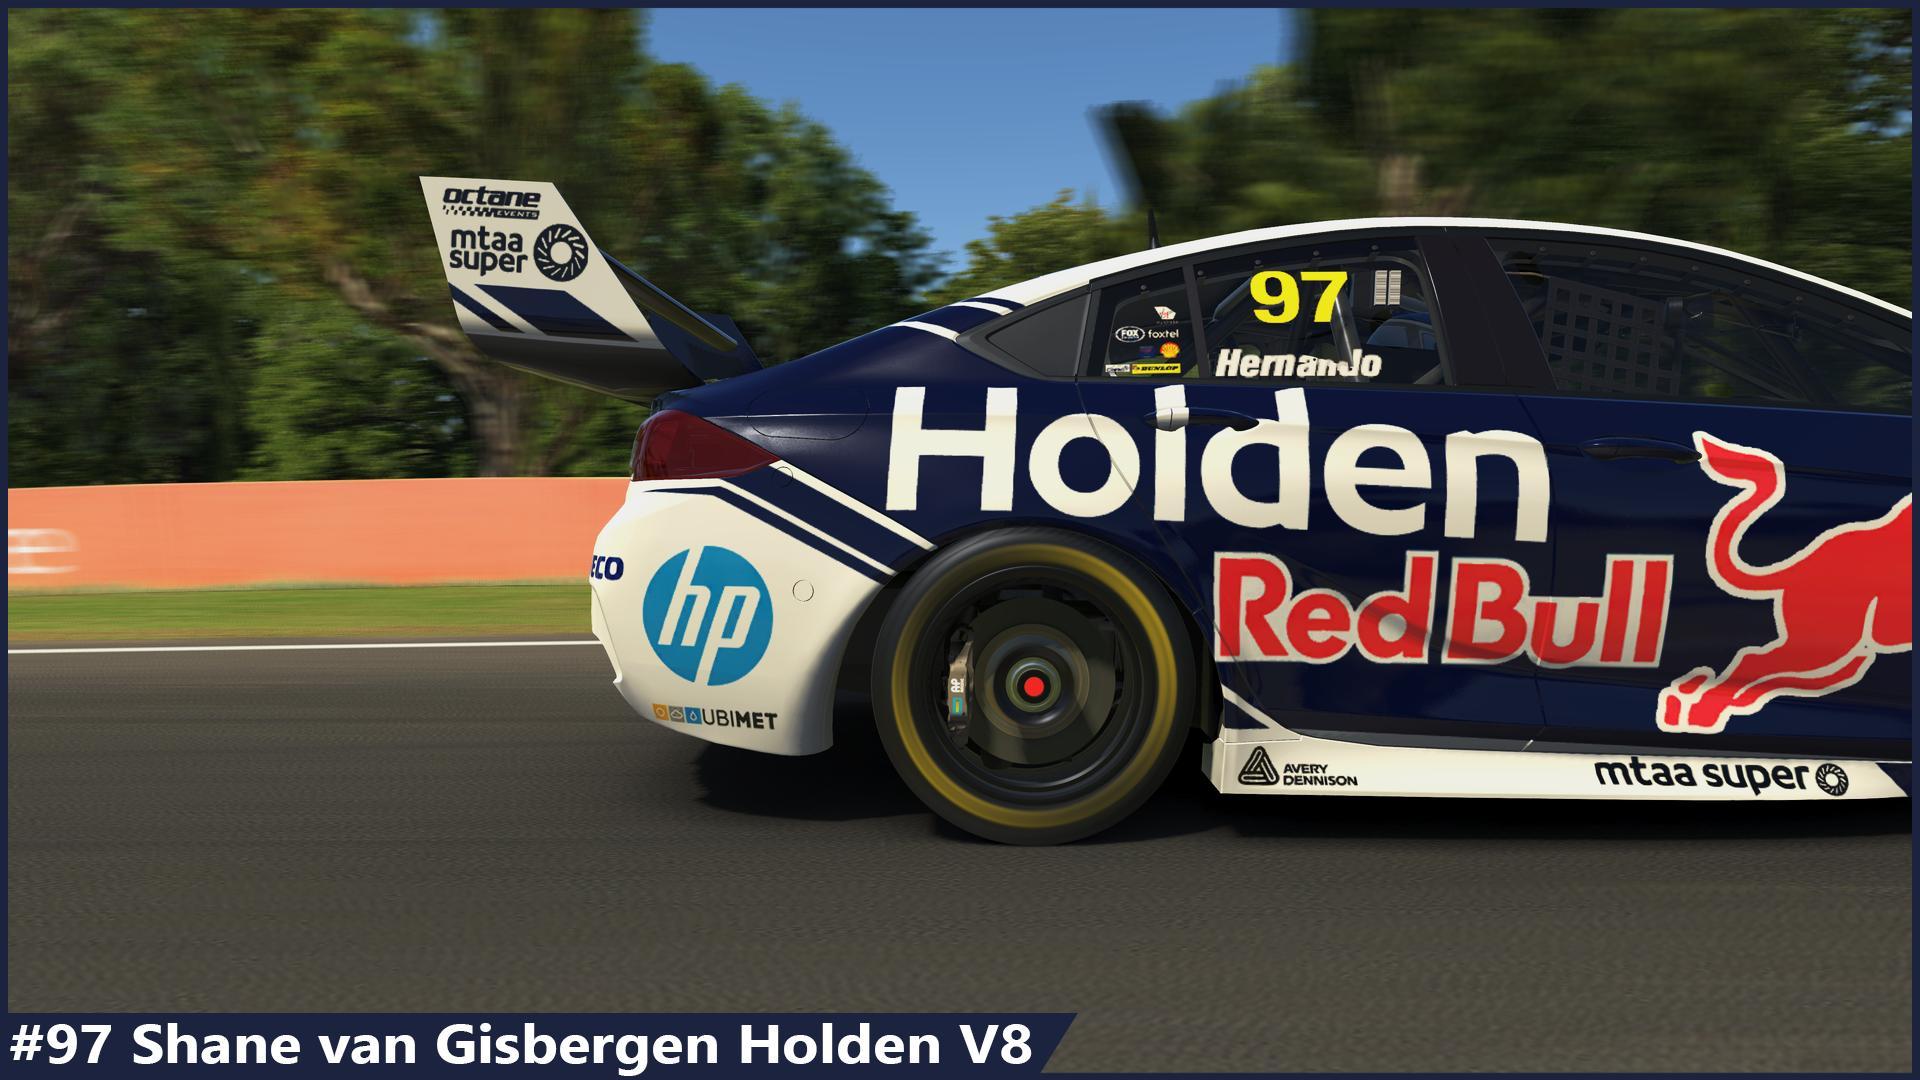 Preview of #97 Shane Van Gisbergen Holden 2019 by Sergio Hernando